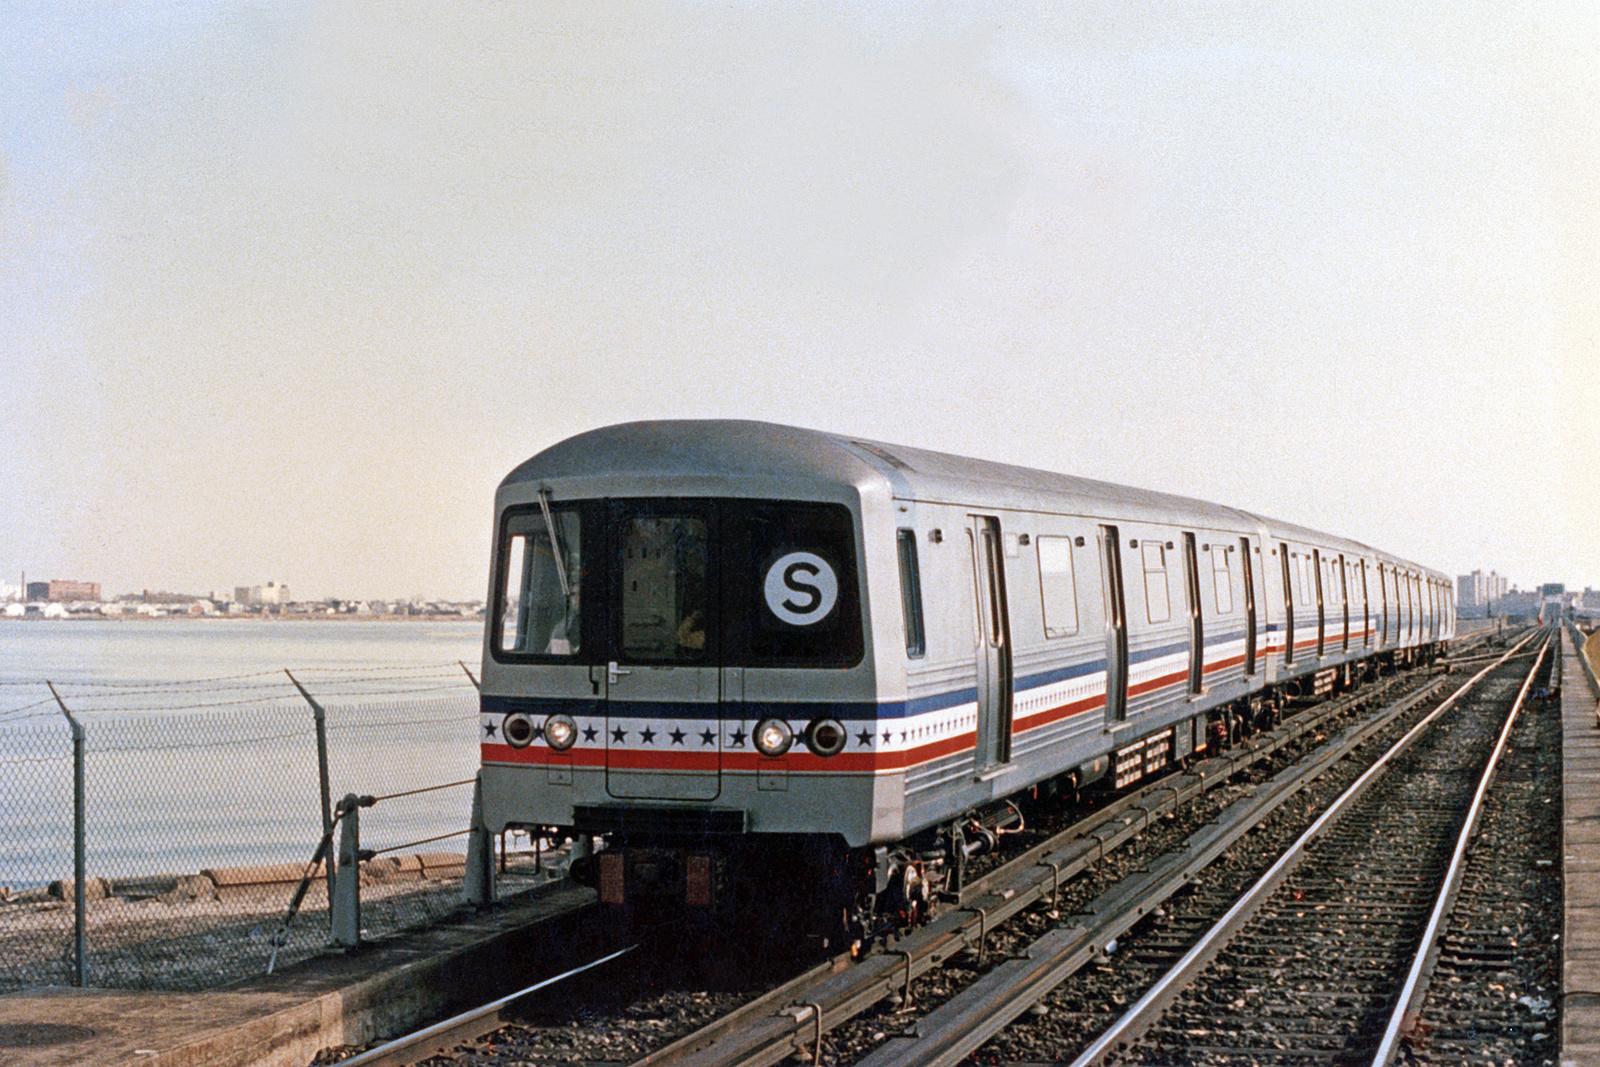 (228k, 820x537)<br><b>Country:</b> United States<br><b>City:</b> New York<br><b>System:</b> New York City Transit<br><b>Line:</b> IND Rockaway<br><b>Location:</b> Jamaica Bay Crossing<br><b>Car:</b> R-46 (Pullman-Standard, 1974-75) 680 <br><b>Photo by:</b> Constantine Steffan<br><b>Notes:</b> Bicentennial stripe<br><b>Viewed (this week/total):</b> 0 / 4031